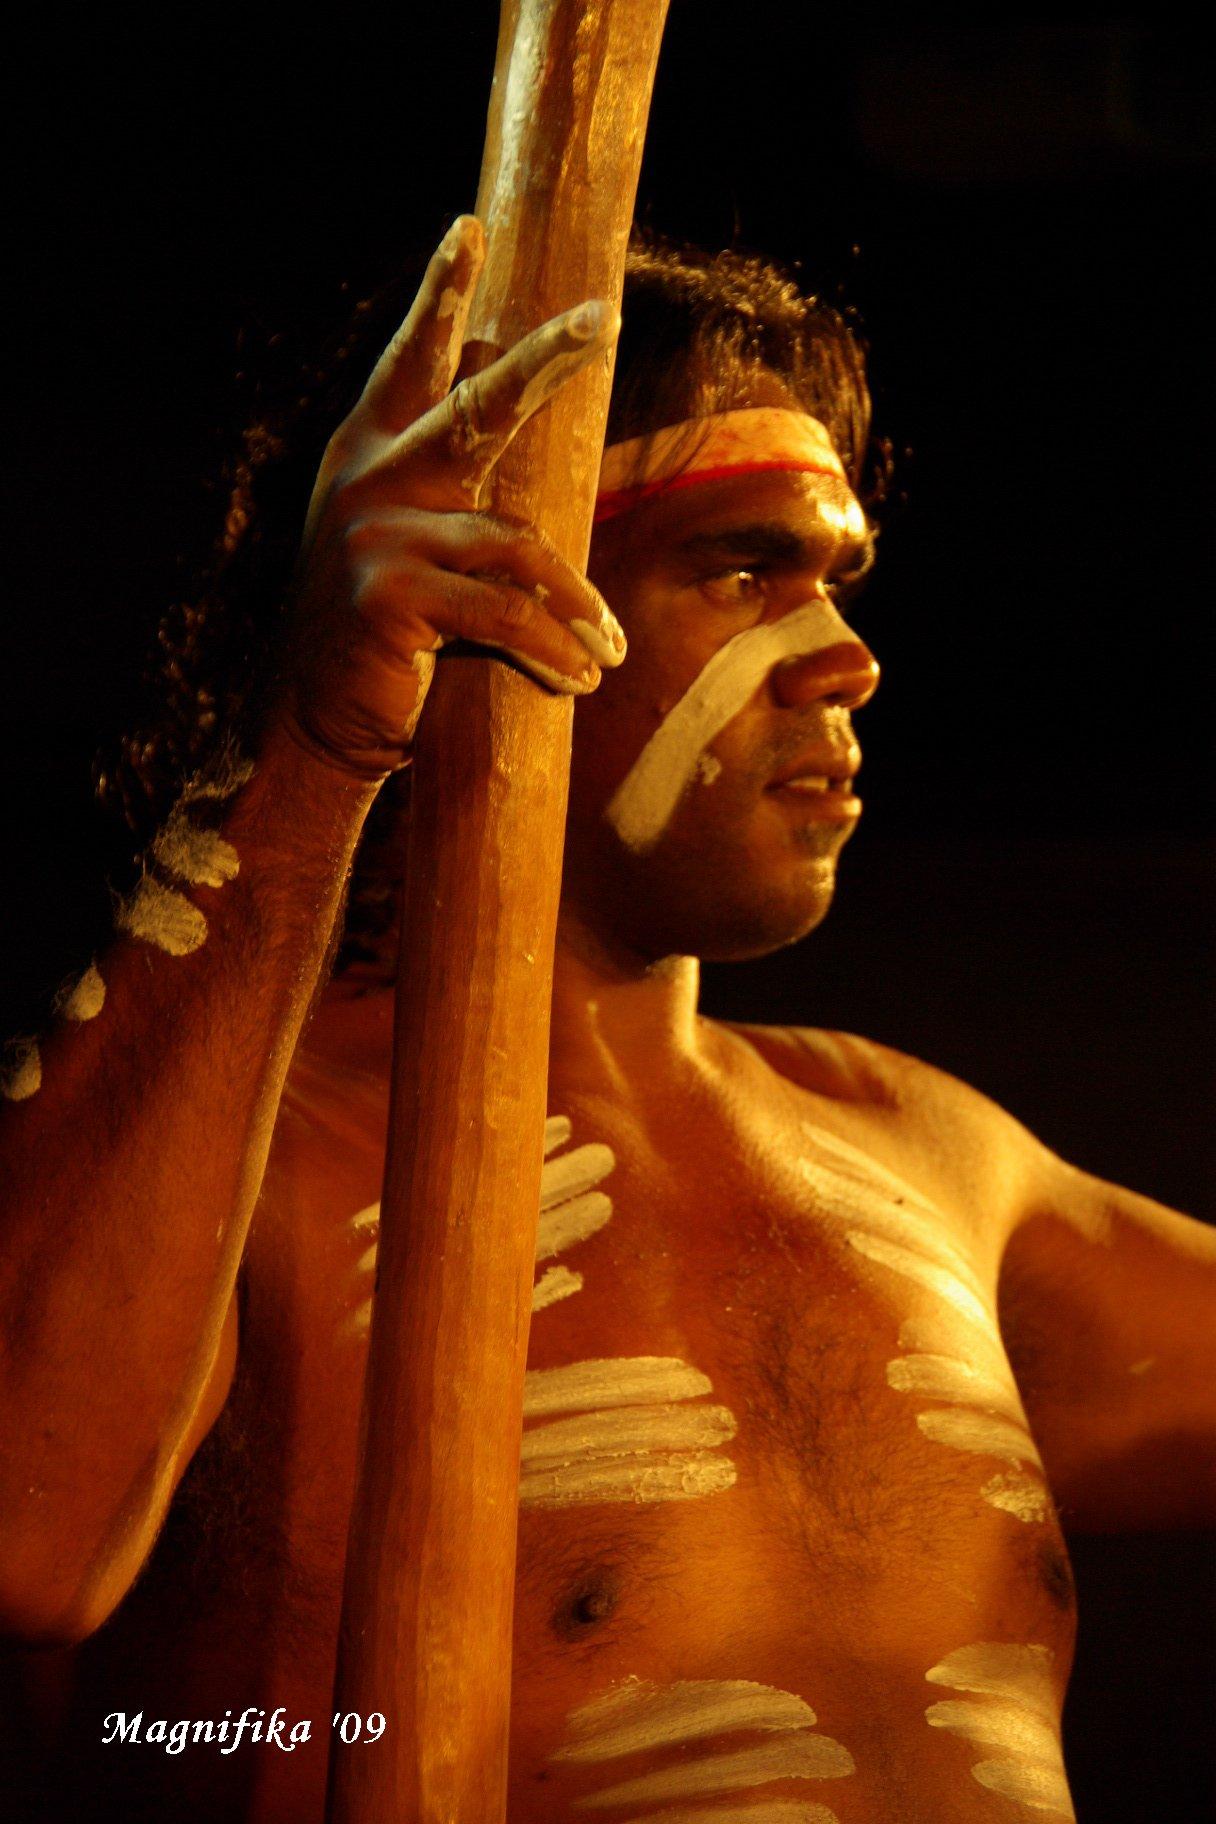 ASUKA II 南太平洋グランドクルーズ2009-25 アボリジニのショー Aboriginals Performance_e0140365_22161632.jpg